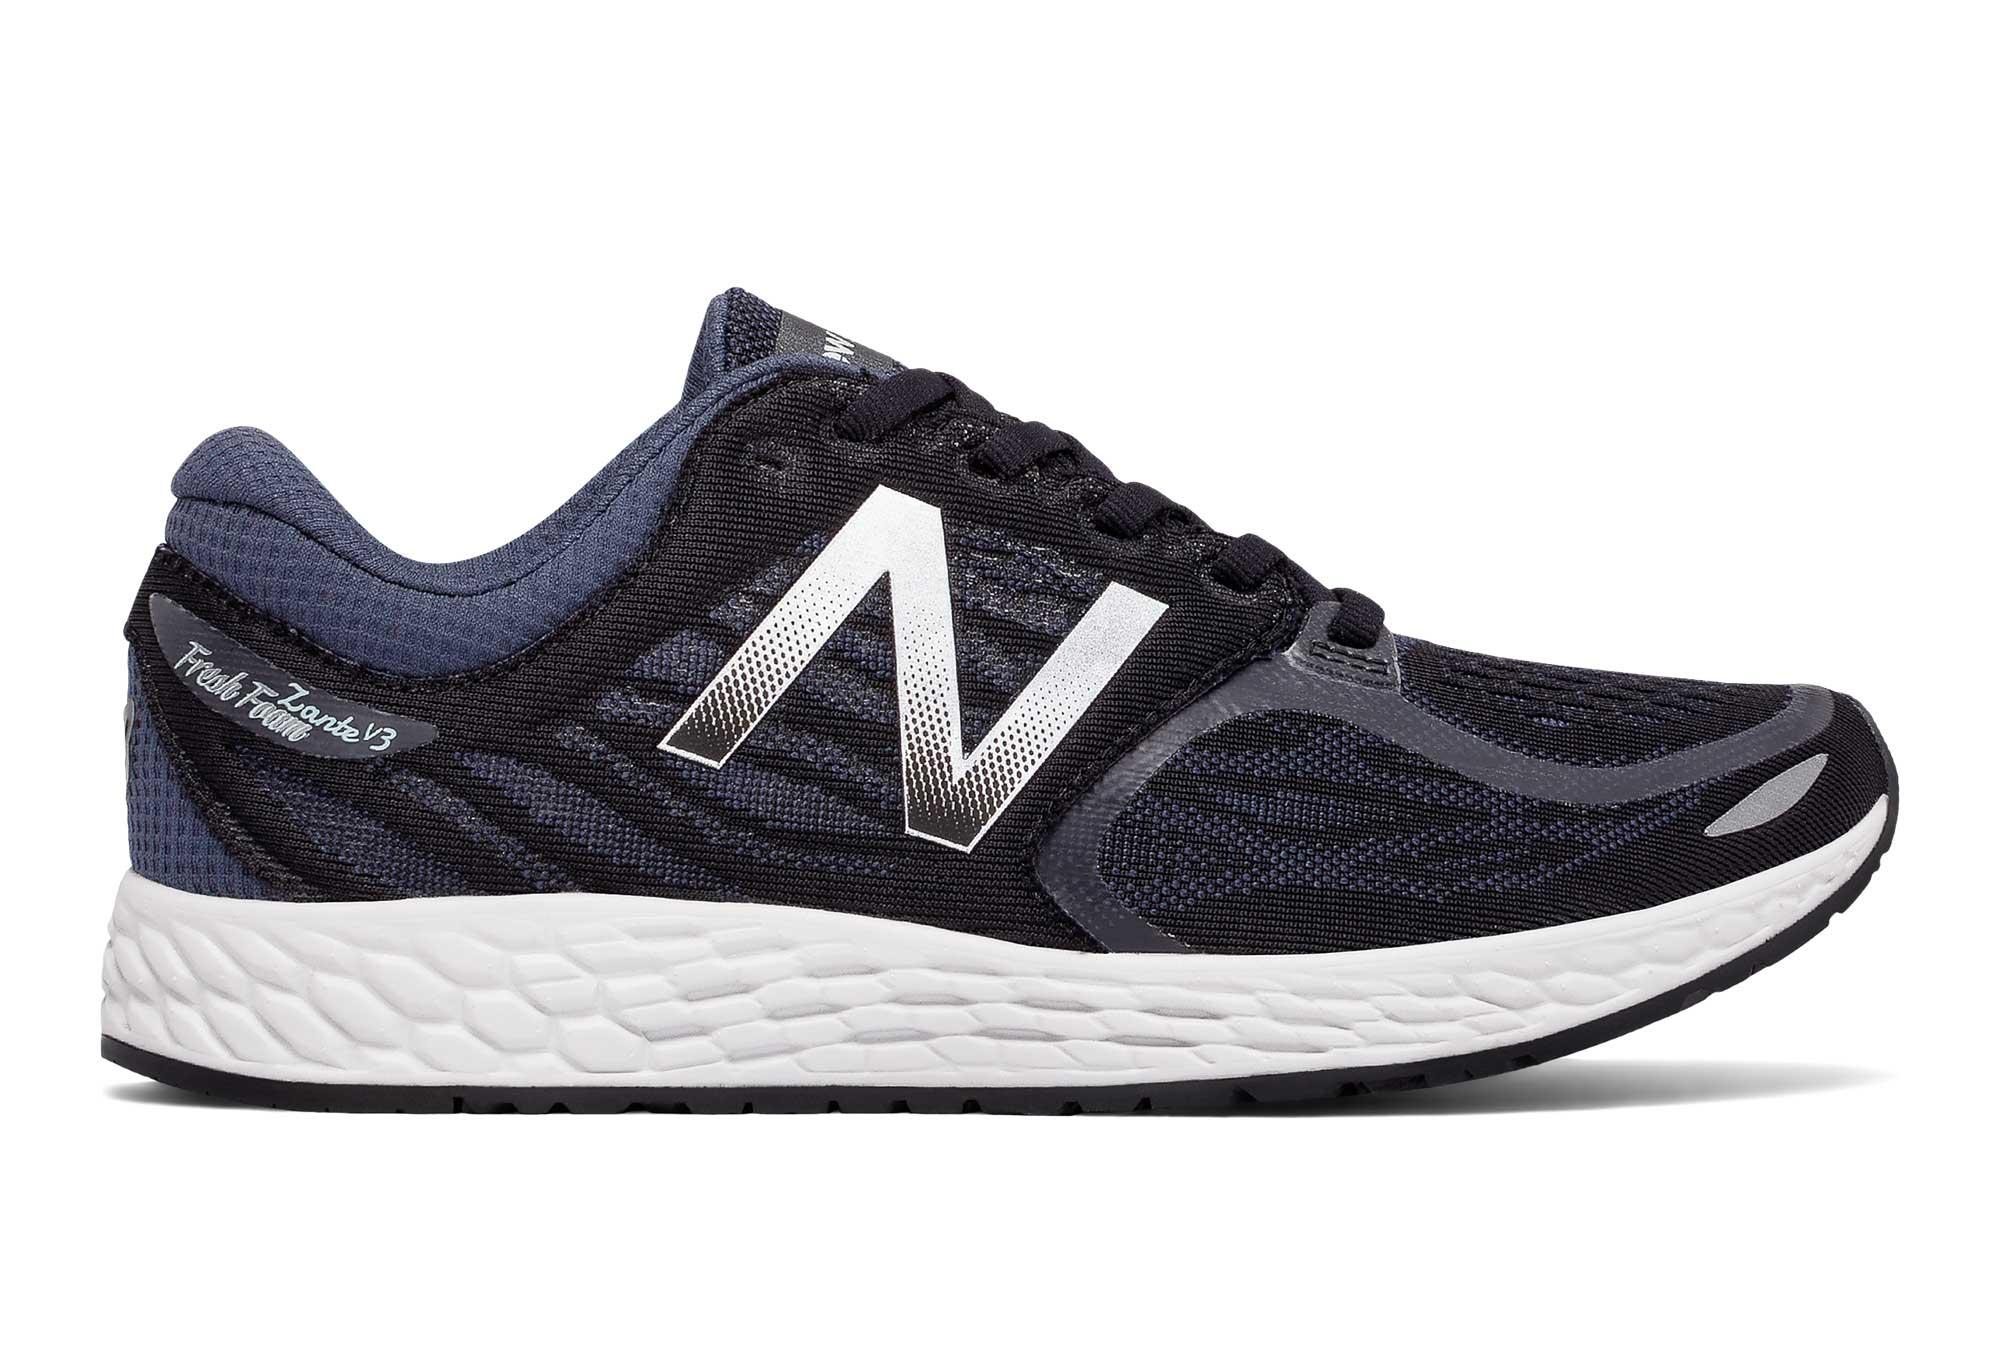 Fresh Foam Zante V3, Zapatillas de Running Mujer, Gris (Grey),41 EU New Balance